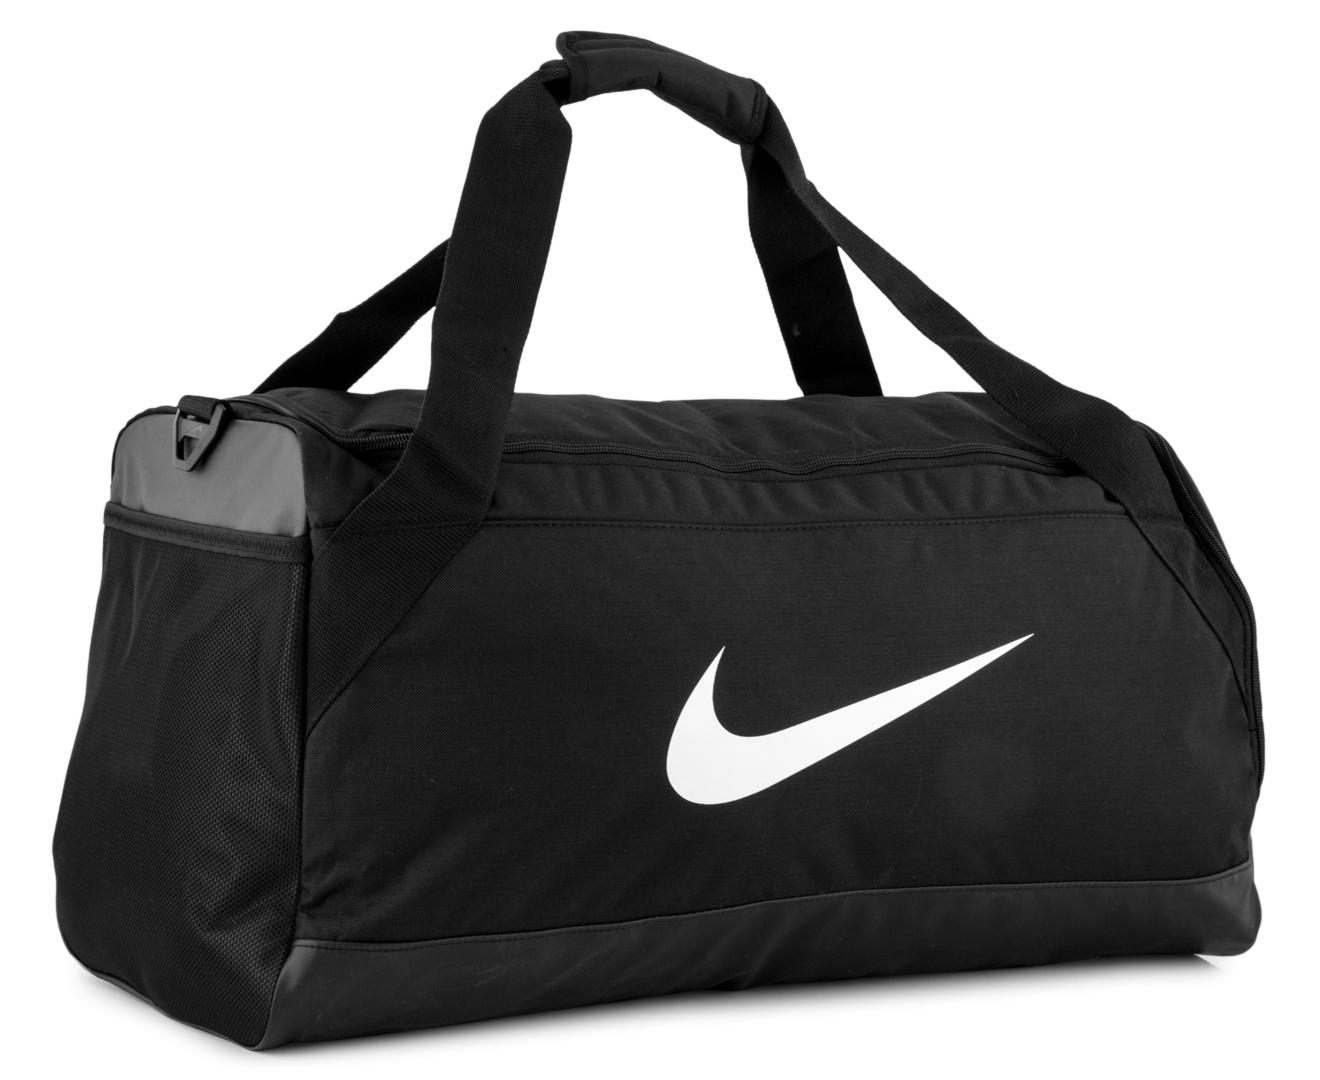 5265fadc2f183 Nike Brasilia Medium Duffle Bag - Black White